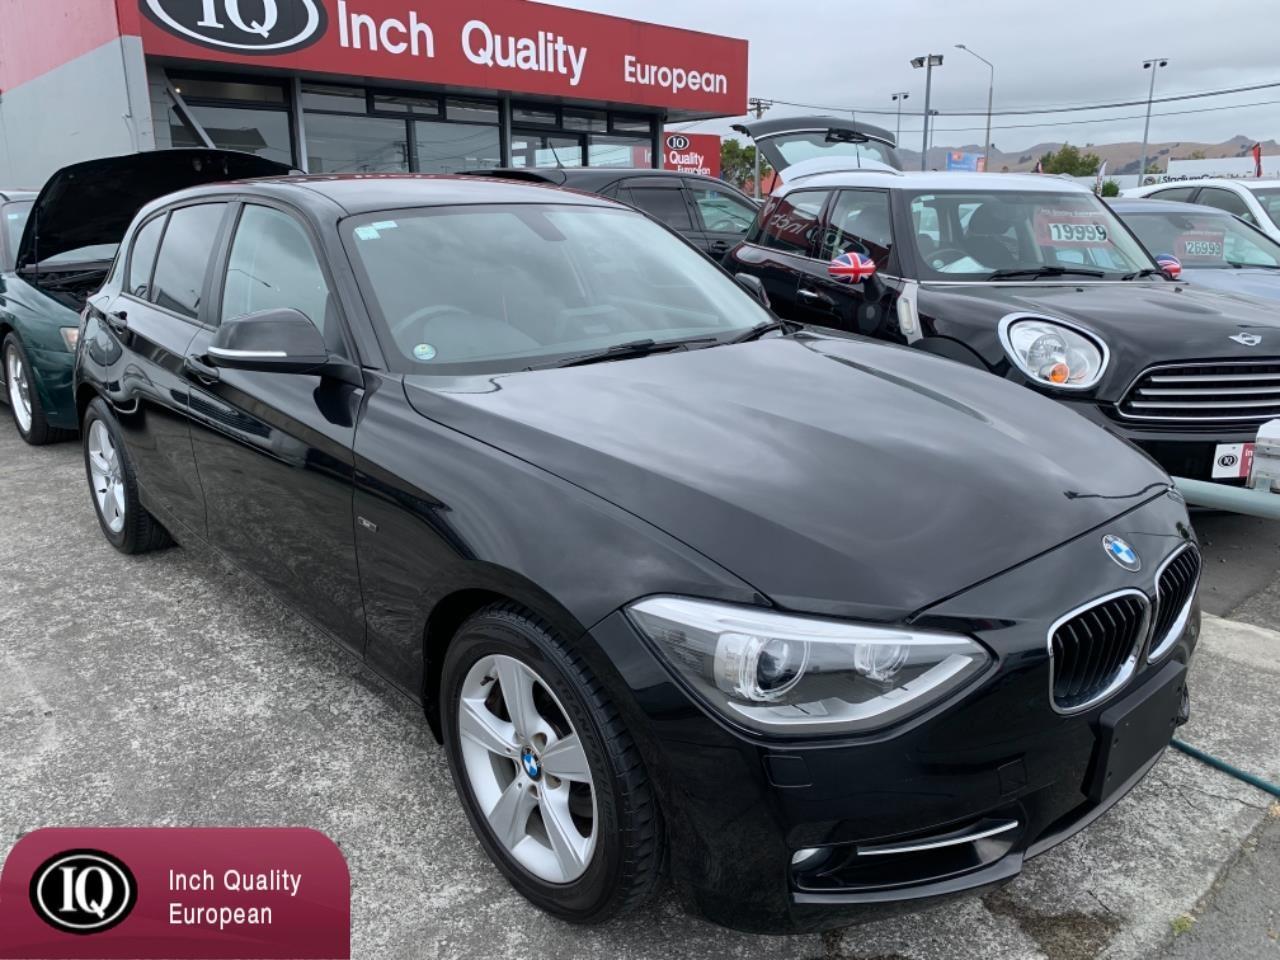 image-0, 2012 BMW 116I Sport at Christchurch